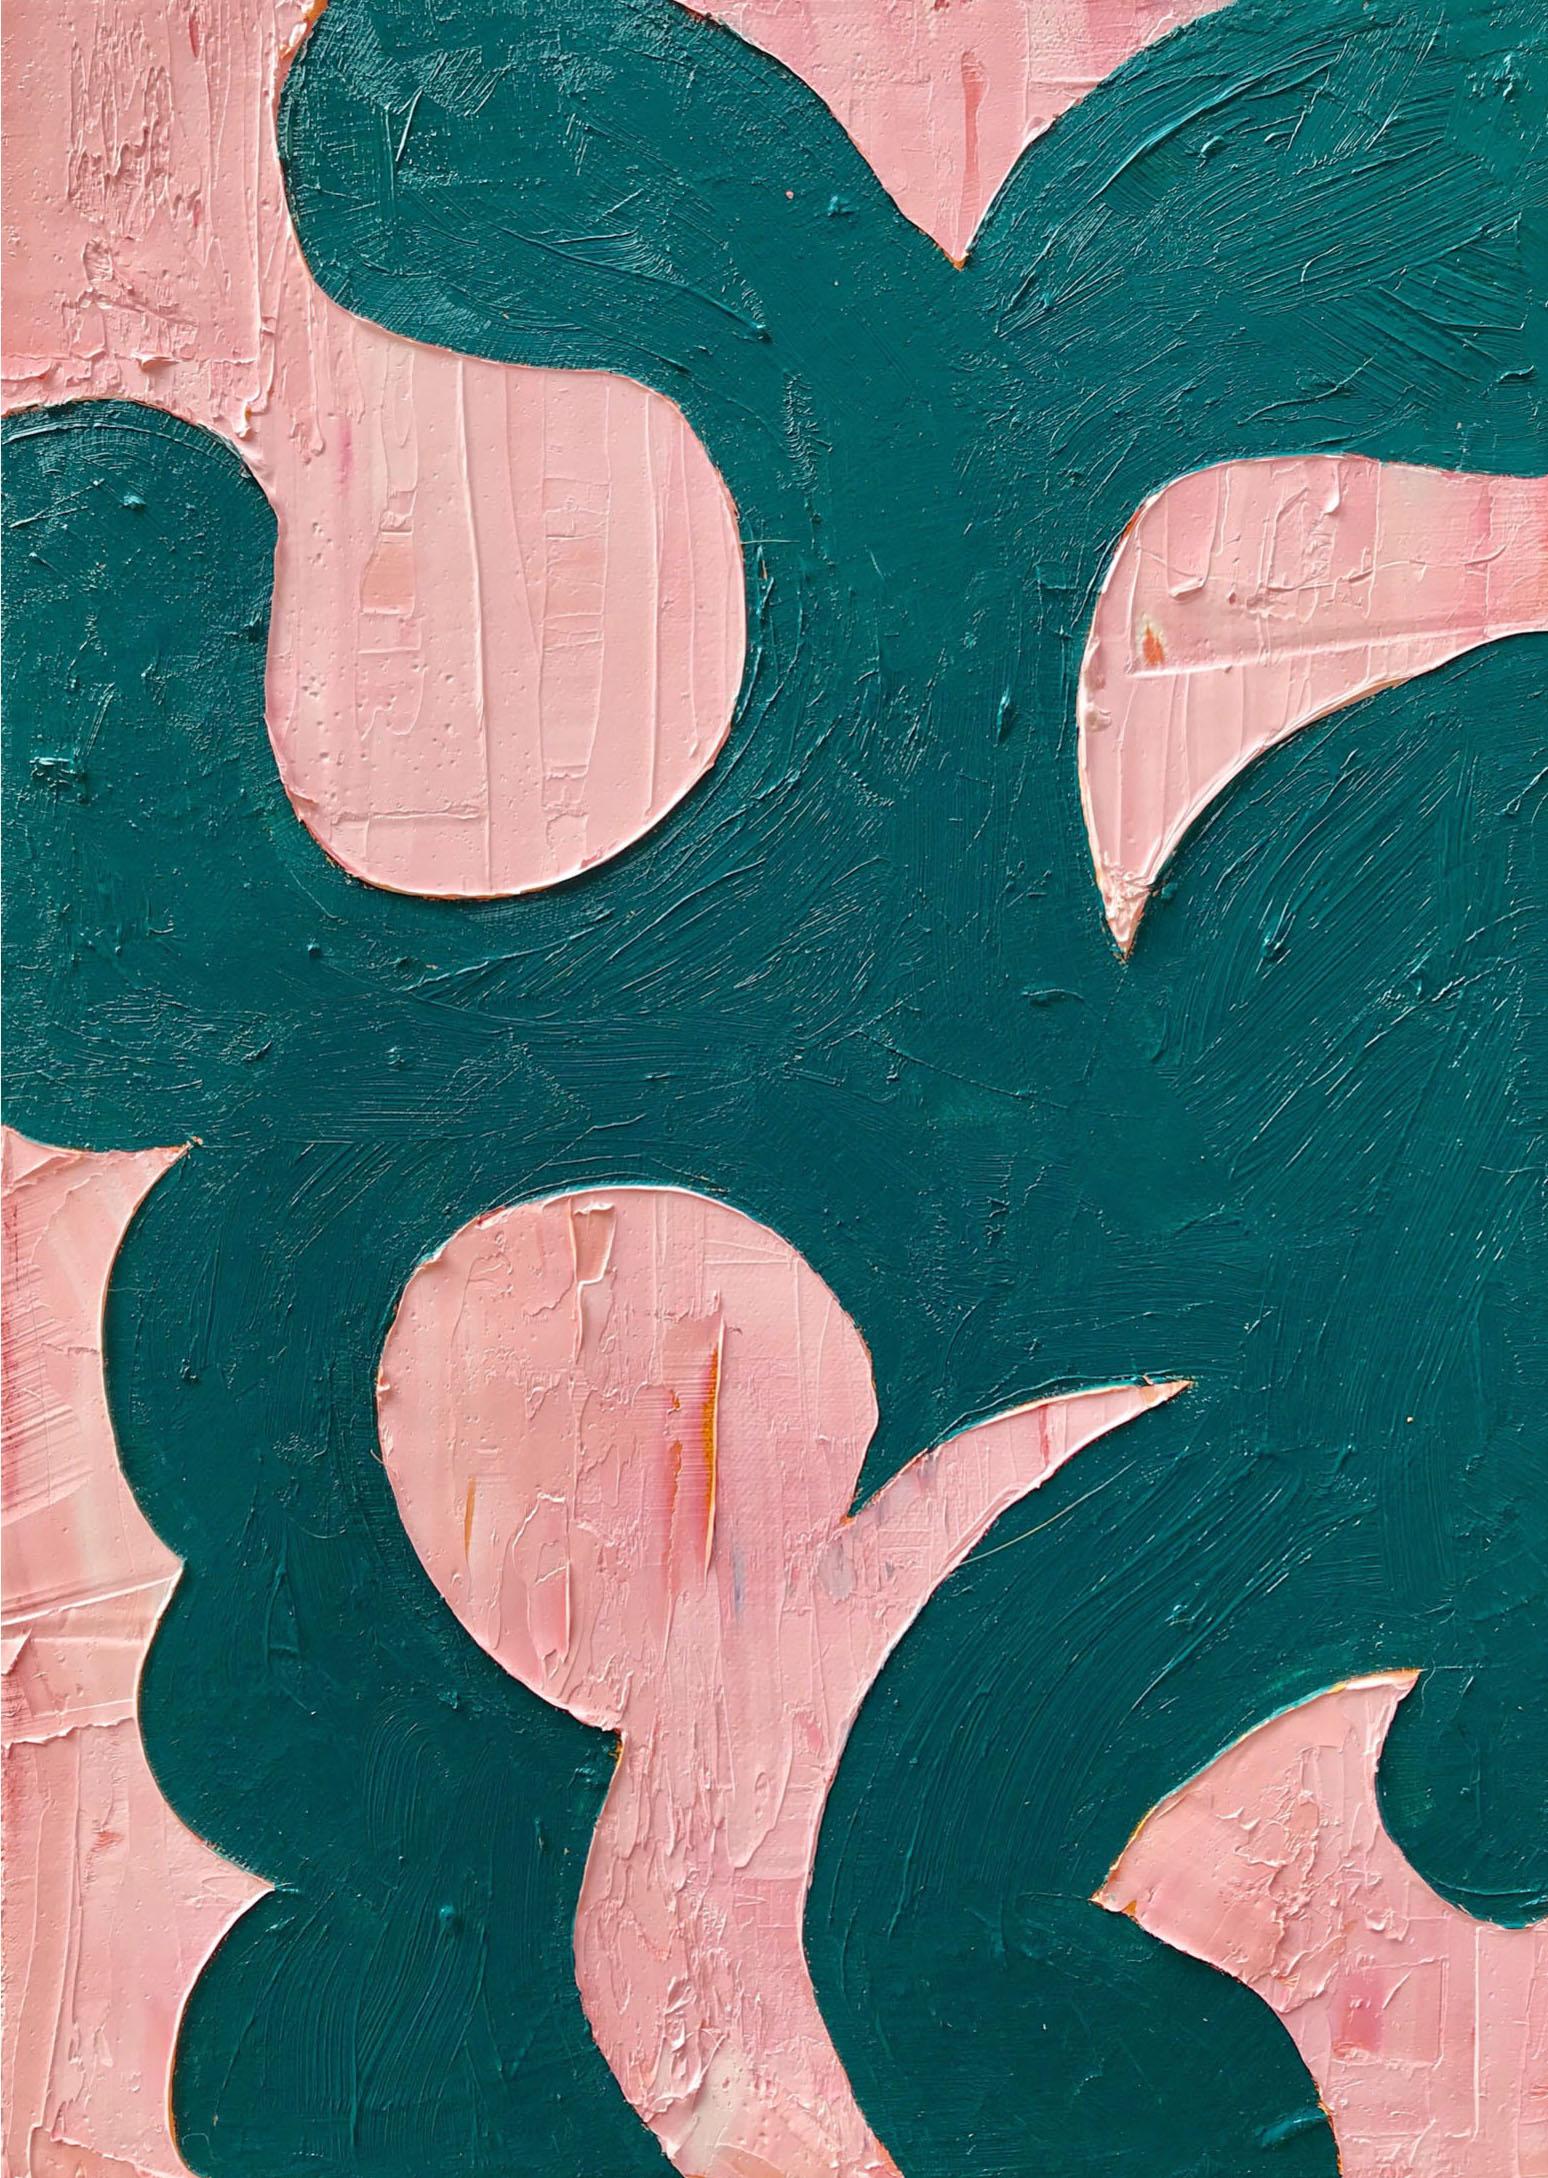 pinkgreen dissonance